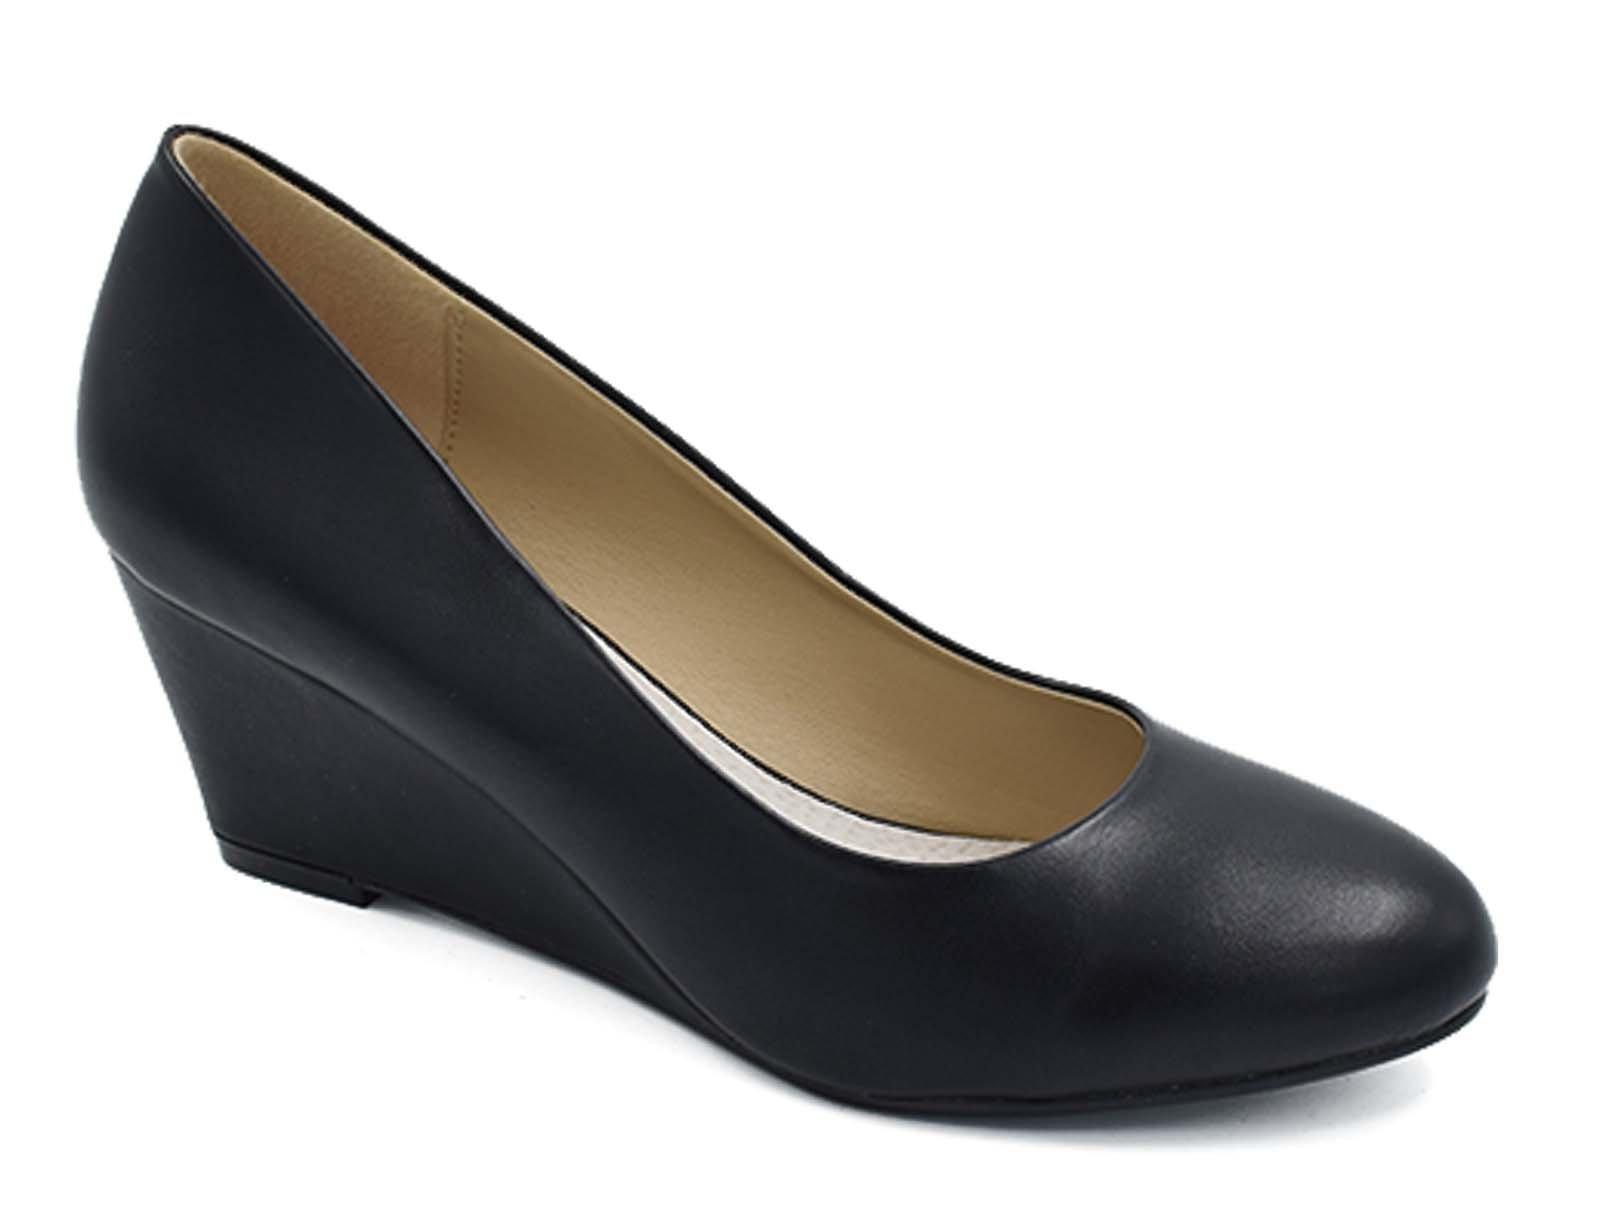 Greatonu Women's Black Patent Slip On Round Toe Mid Heel Wedge Pump Shoes Size 9